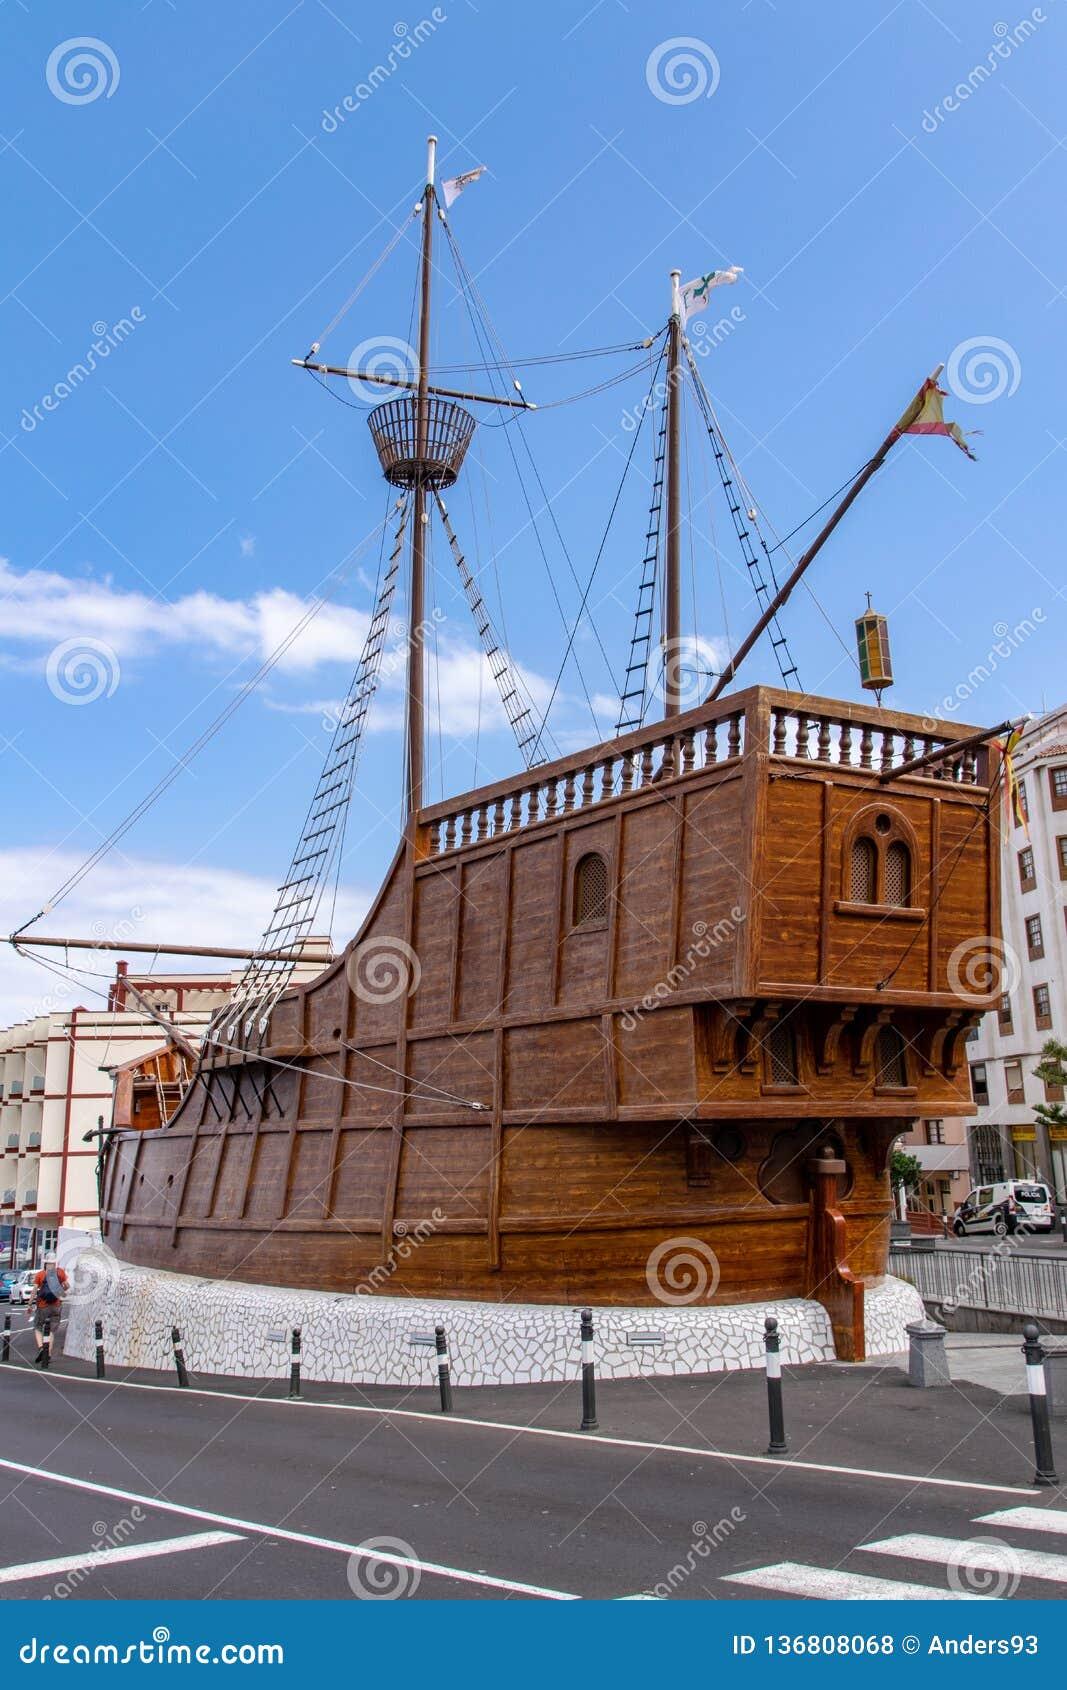 La Palma Maritime Museum als replica van Christopher Columbus Santa Maria-schip in Santa Cruz de la Palma, Canarische Eilanden, S